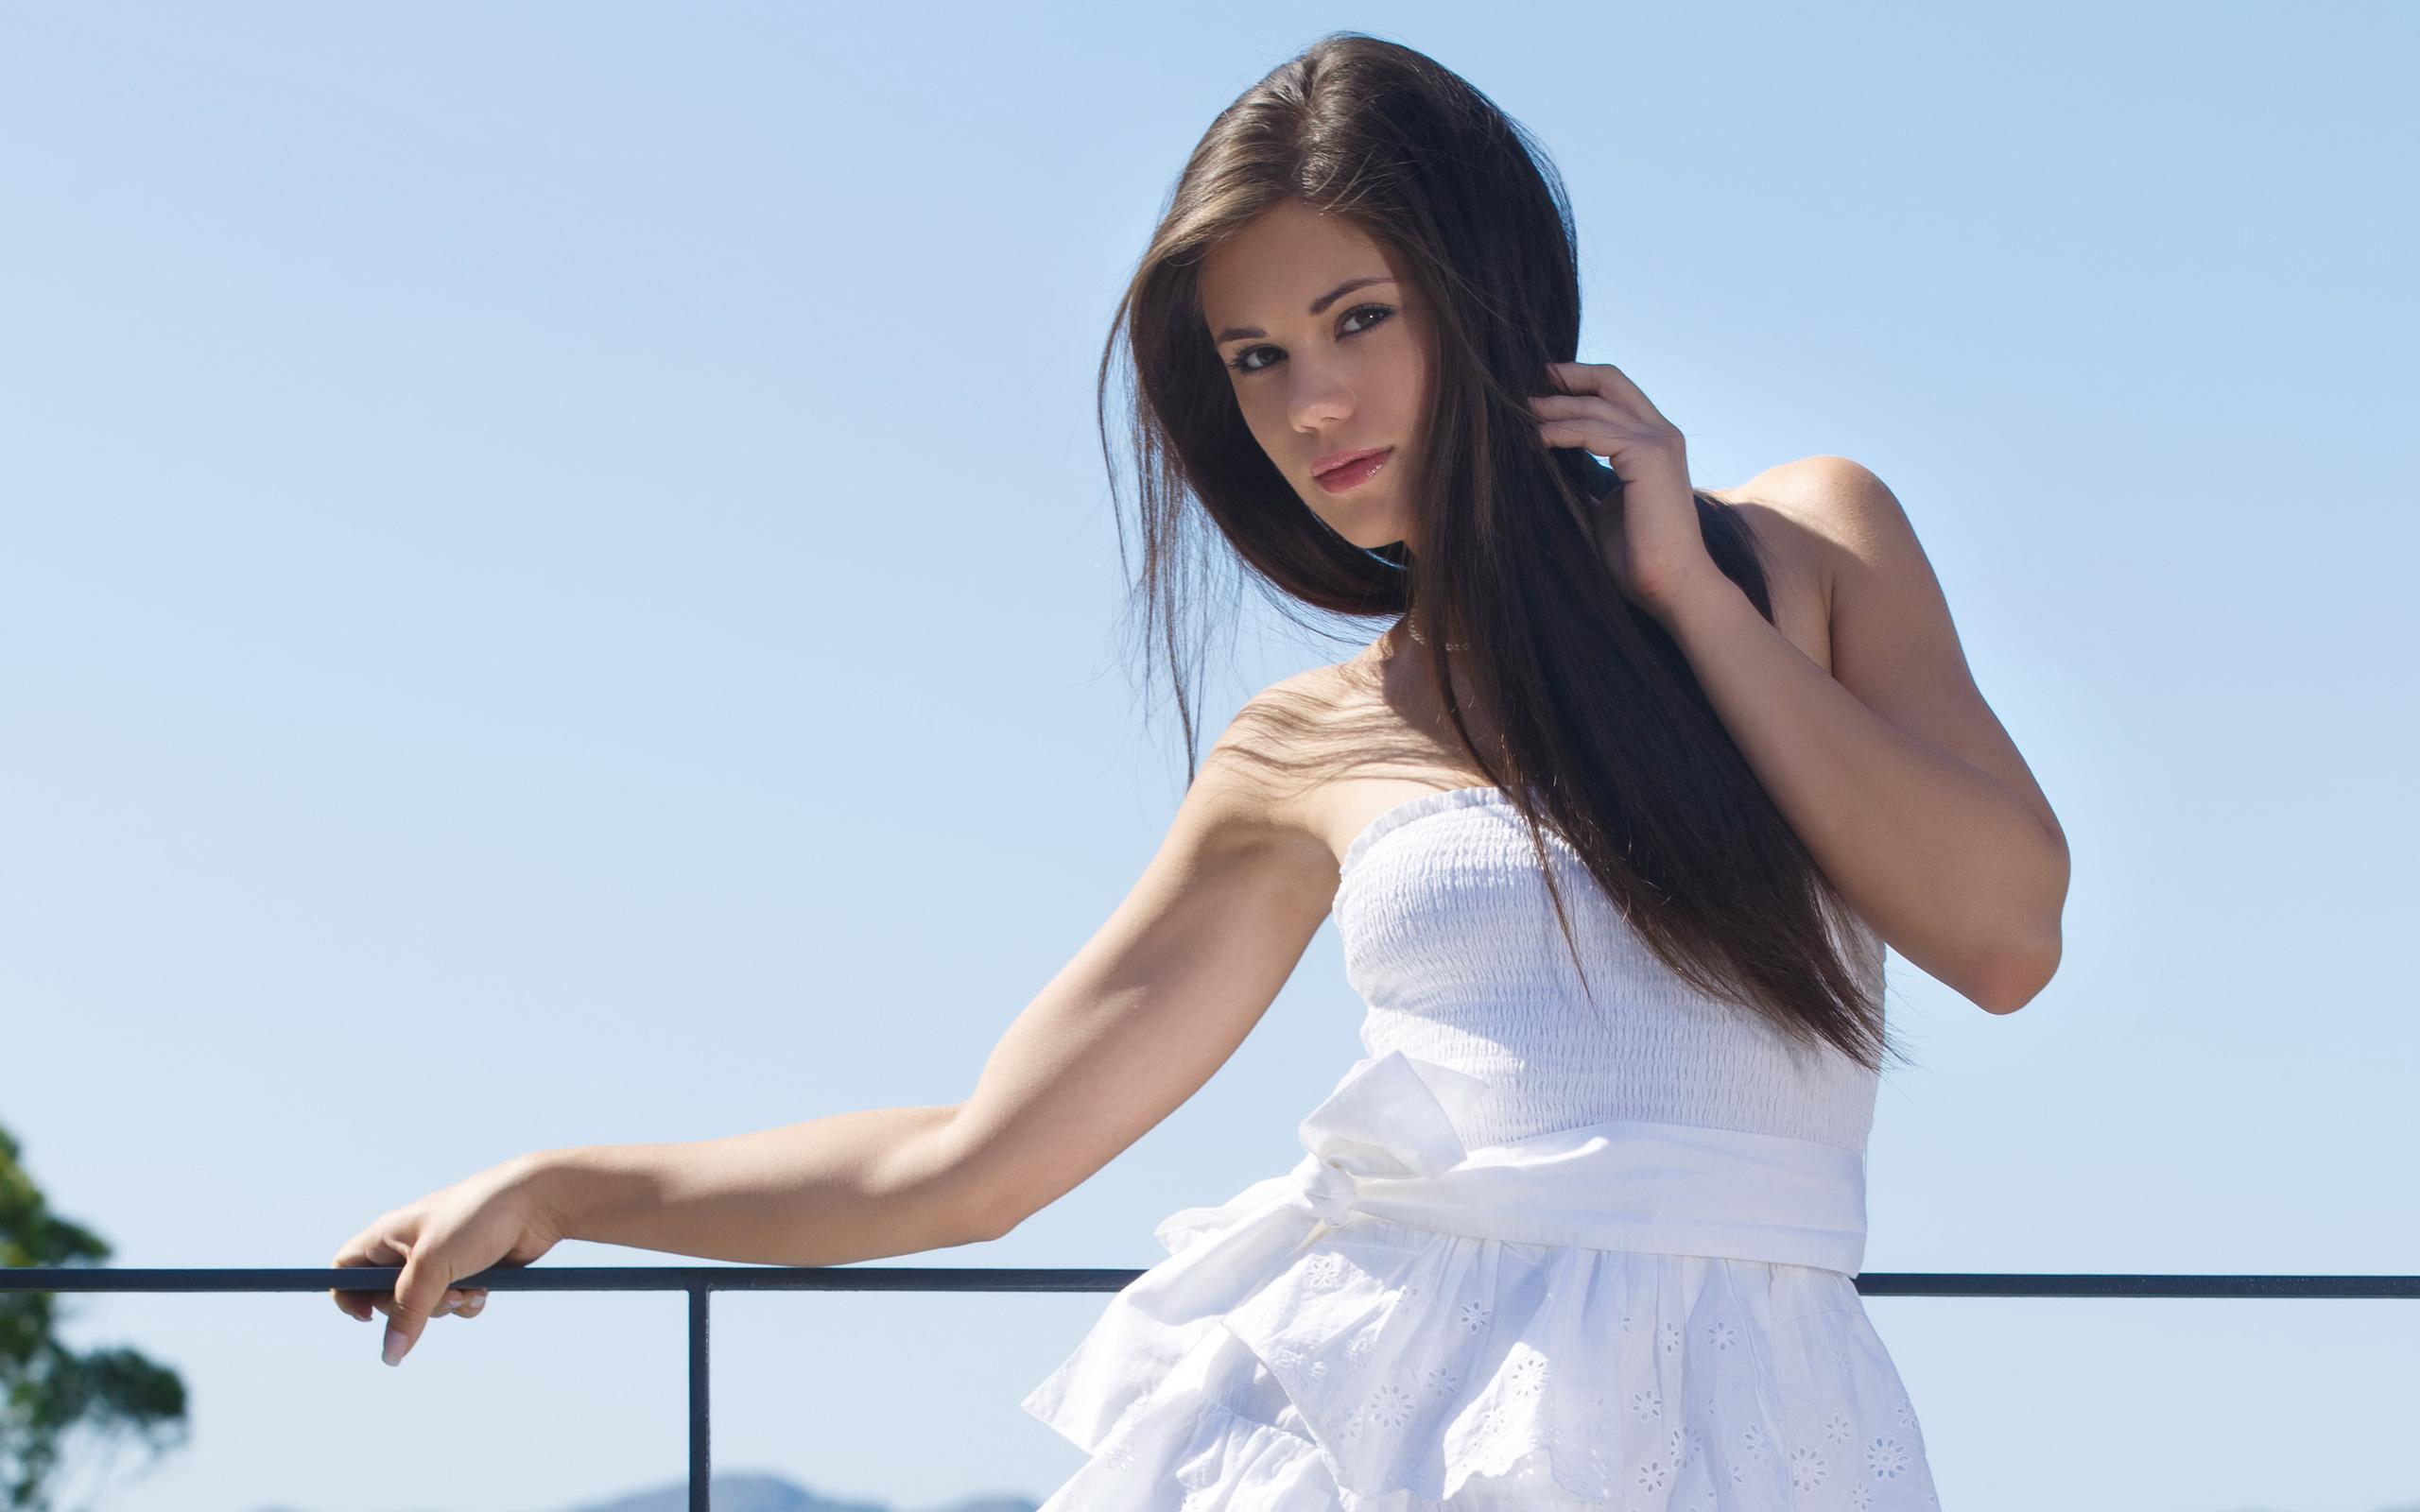 белое платье, красивое лицо, поза, природа, море, небо